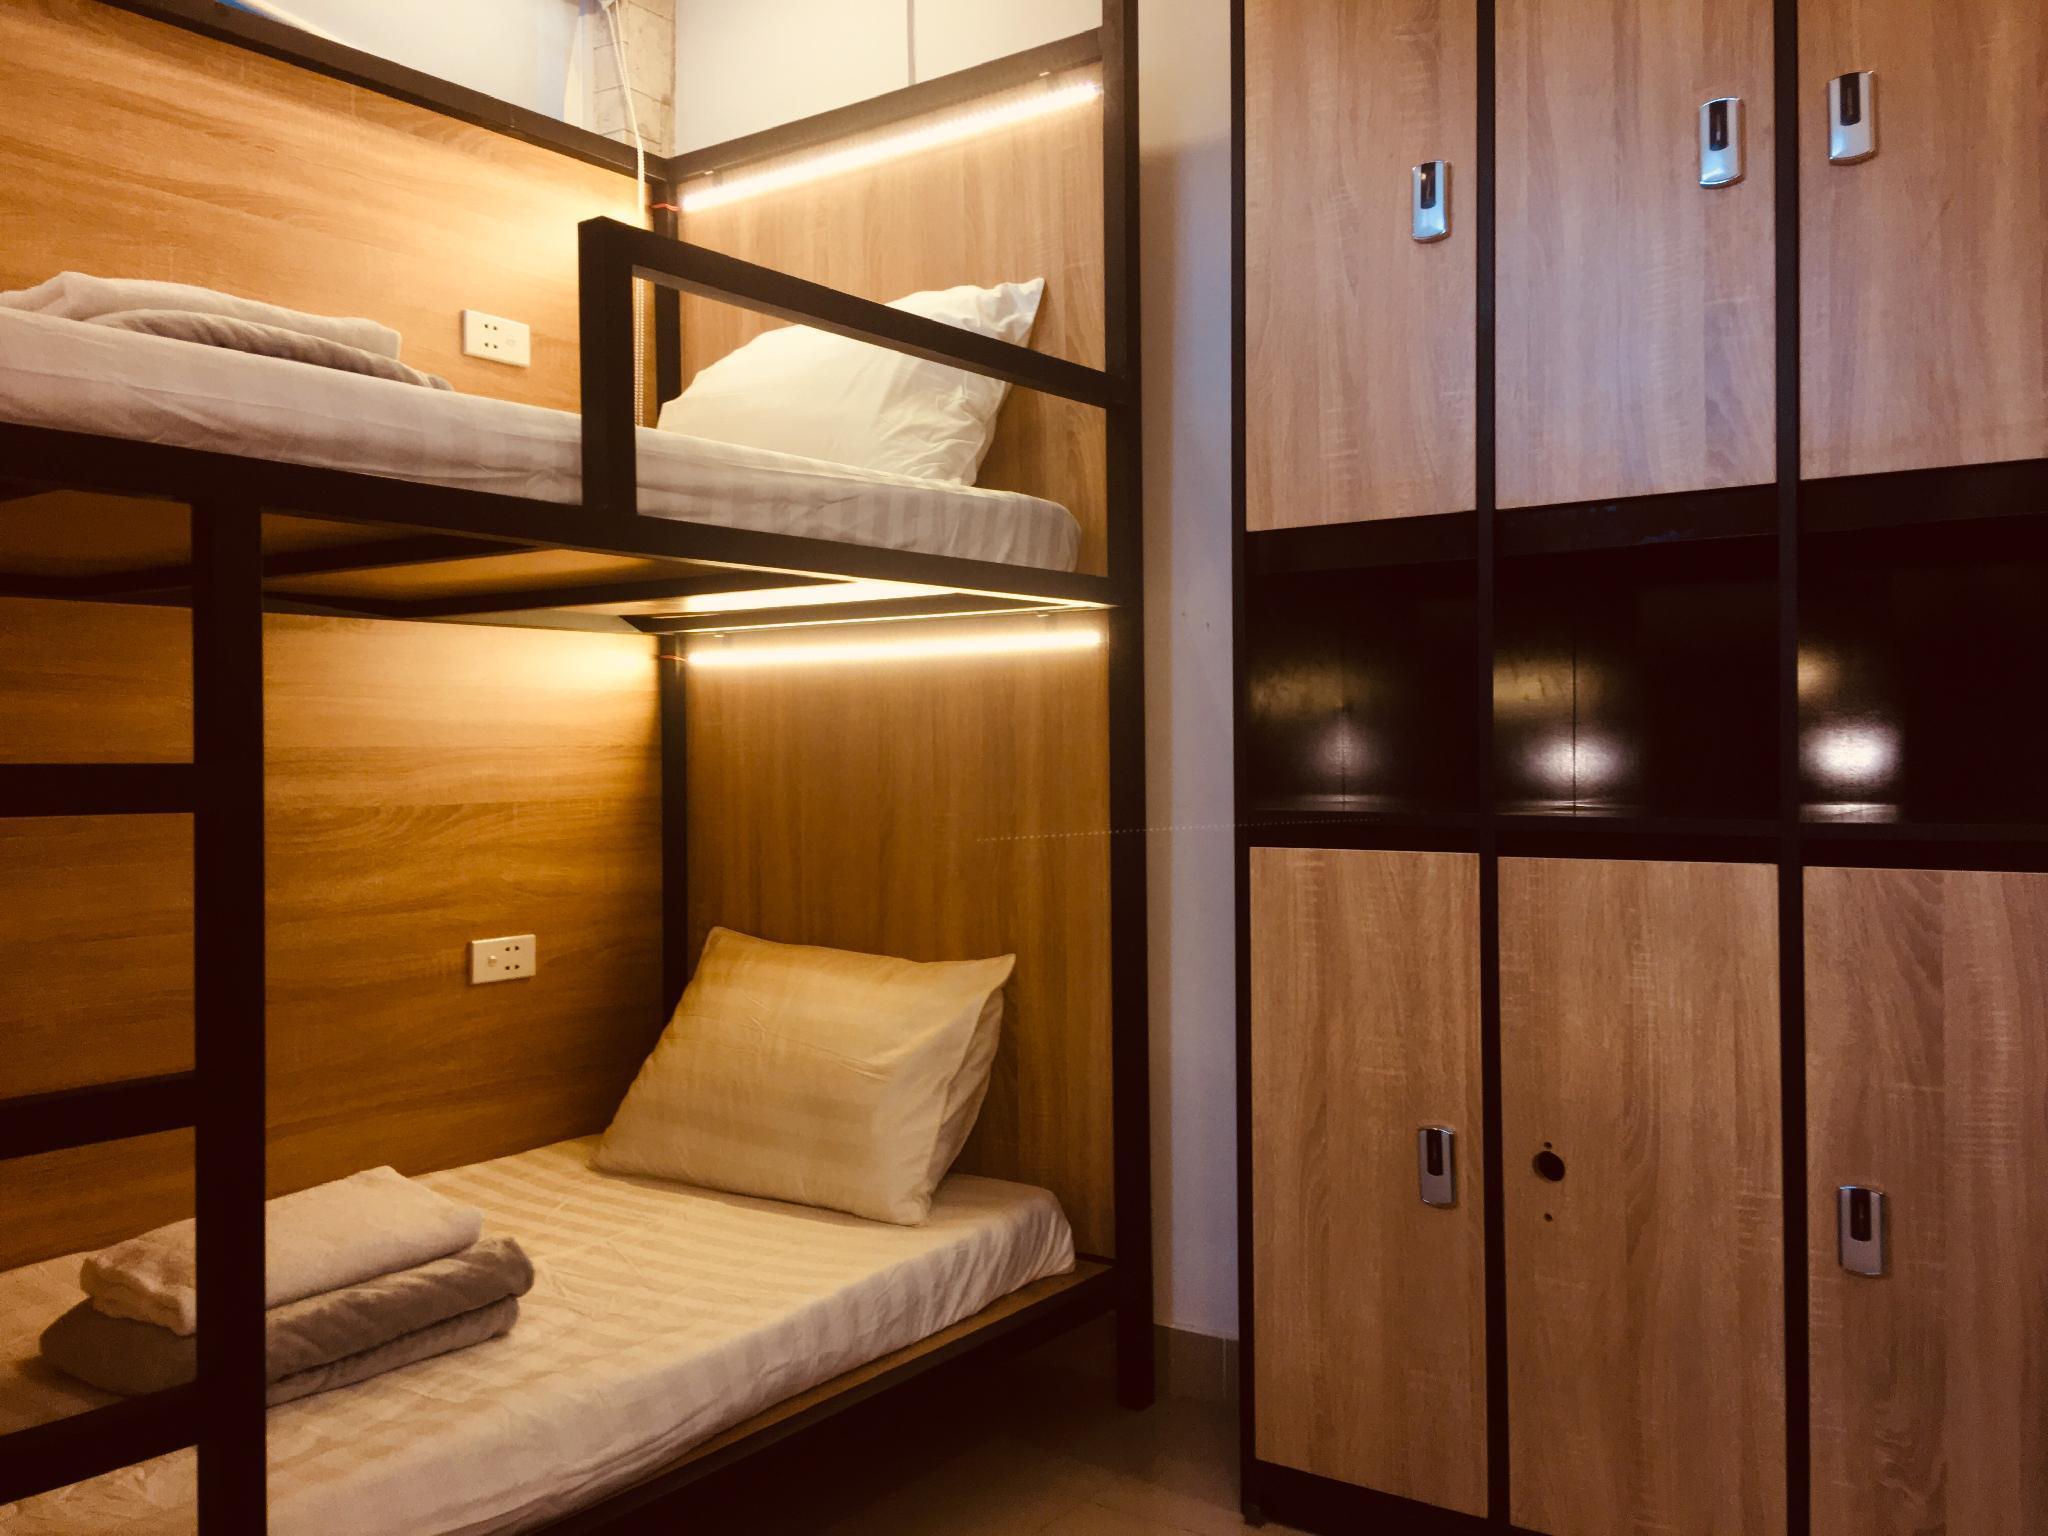 Dorm Room In Bui Vien Walking Street